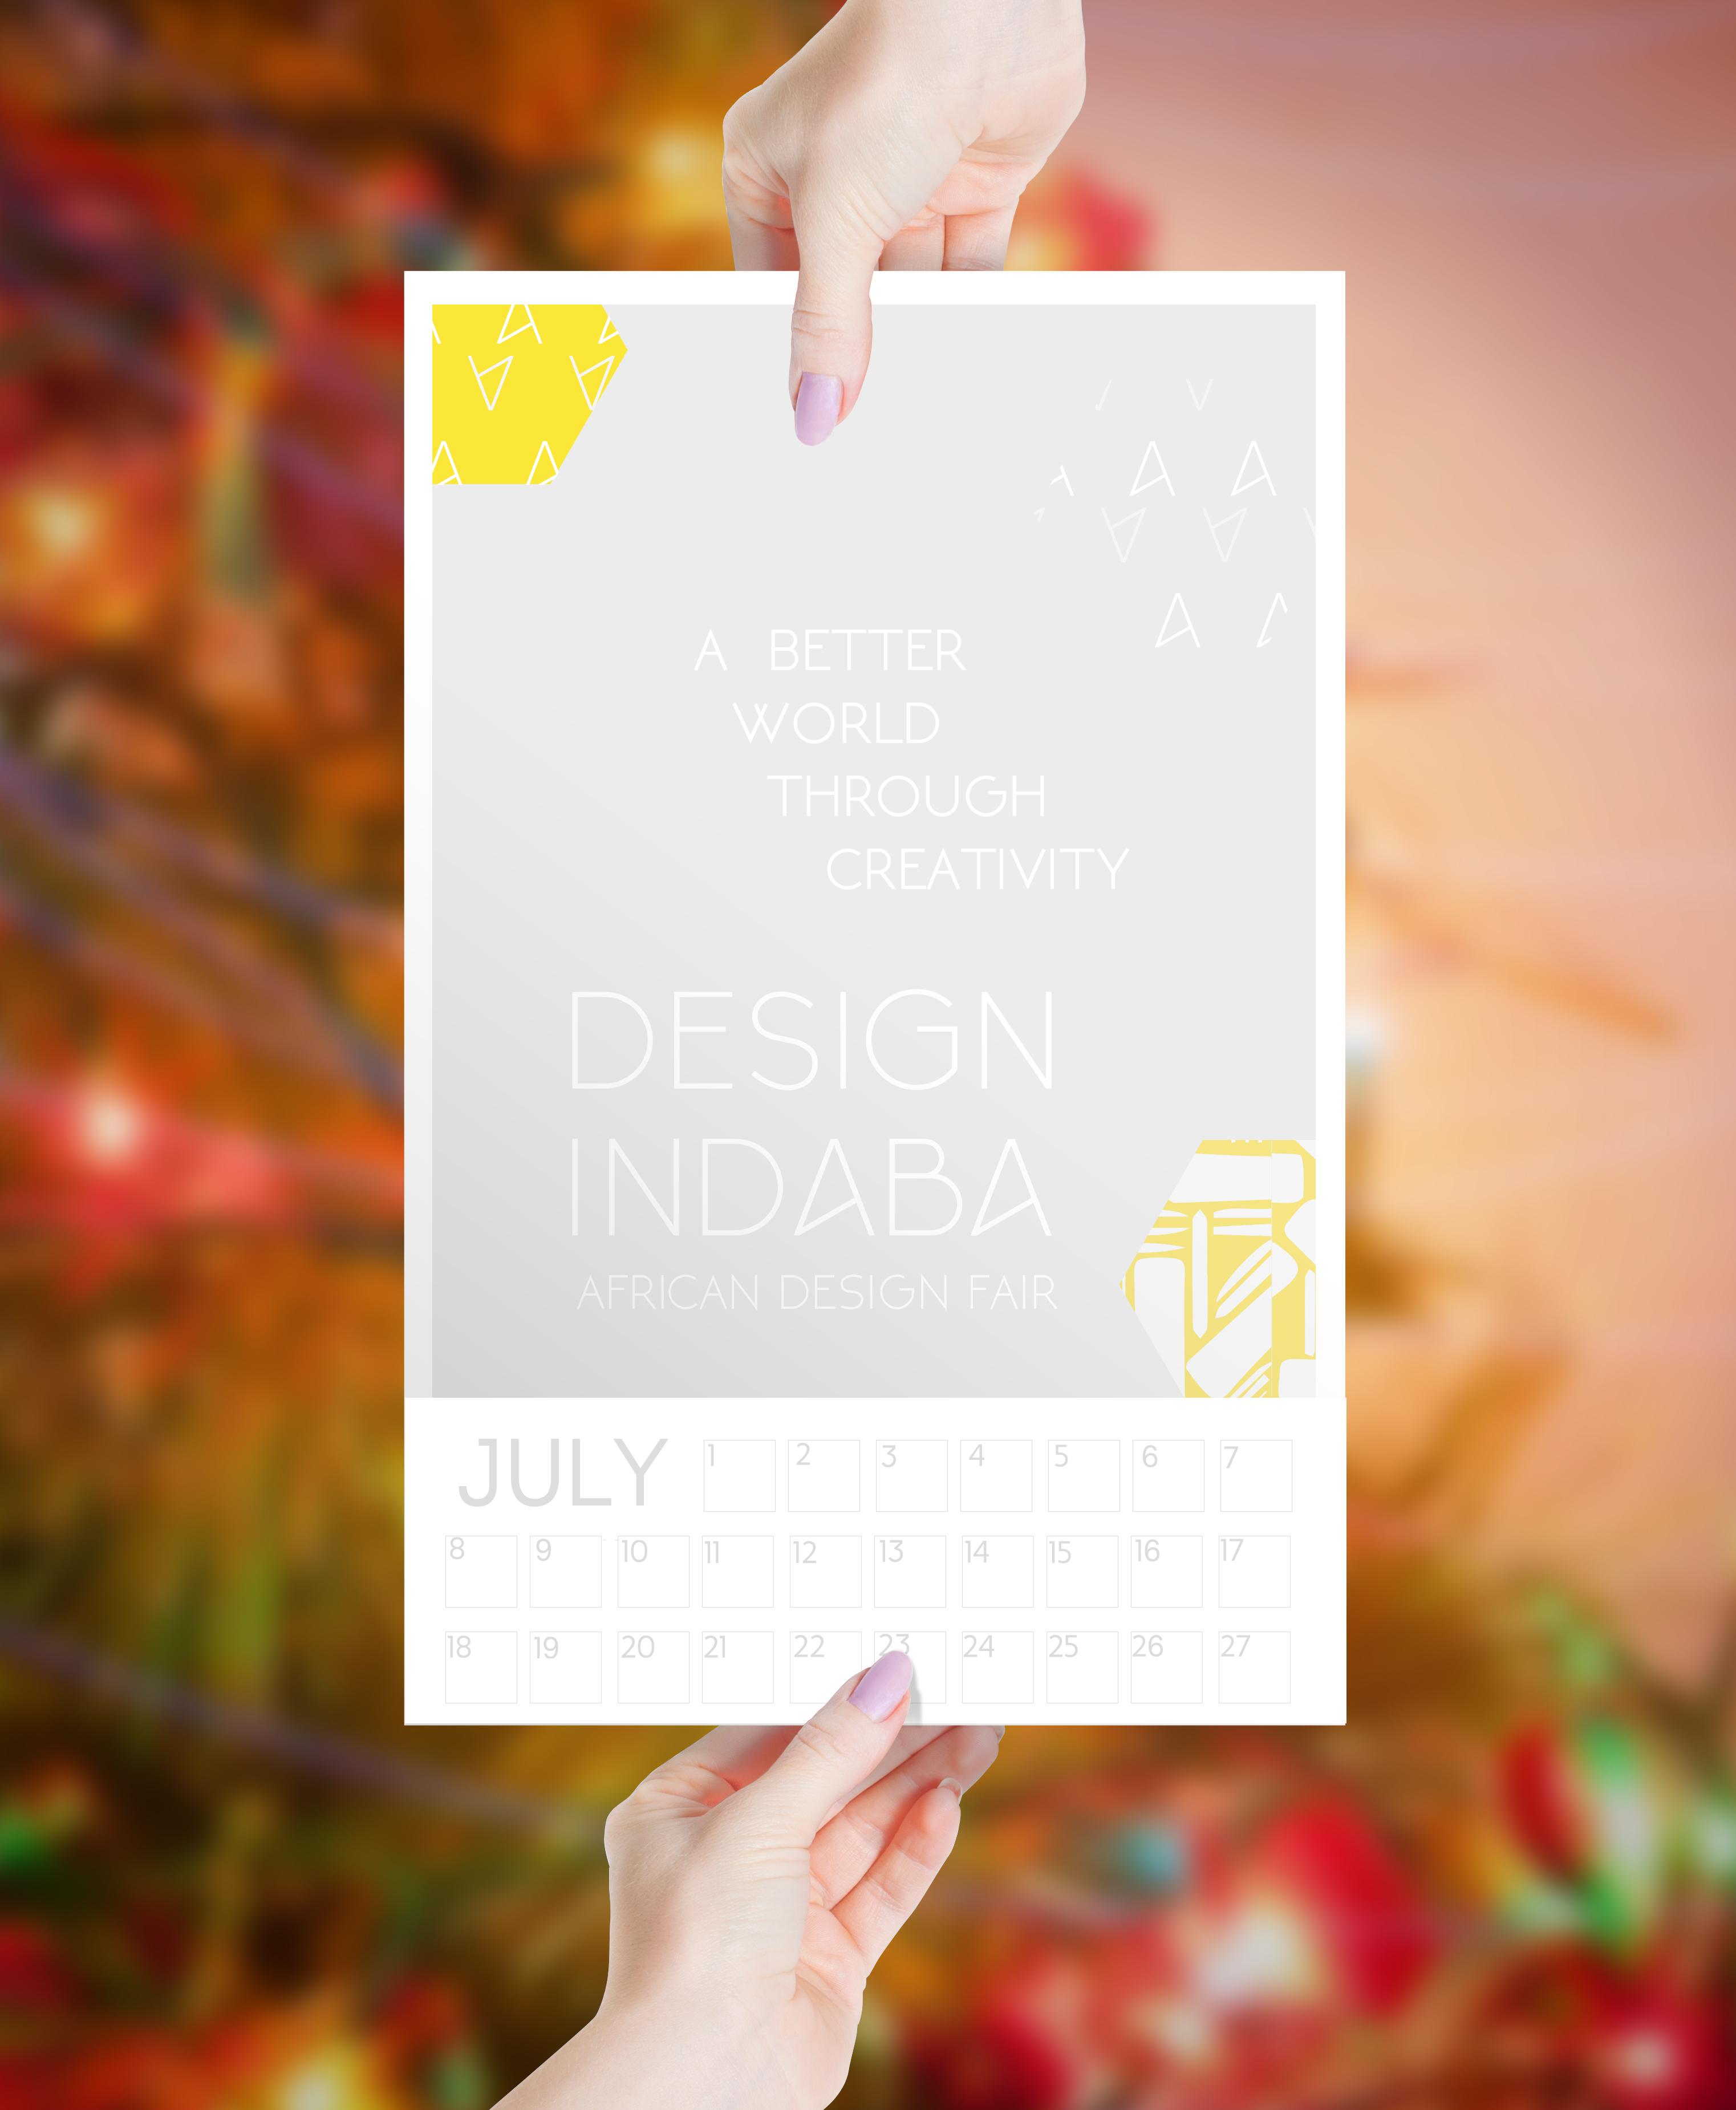 Design Indaba Post-event Calendar